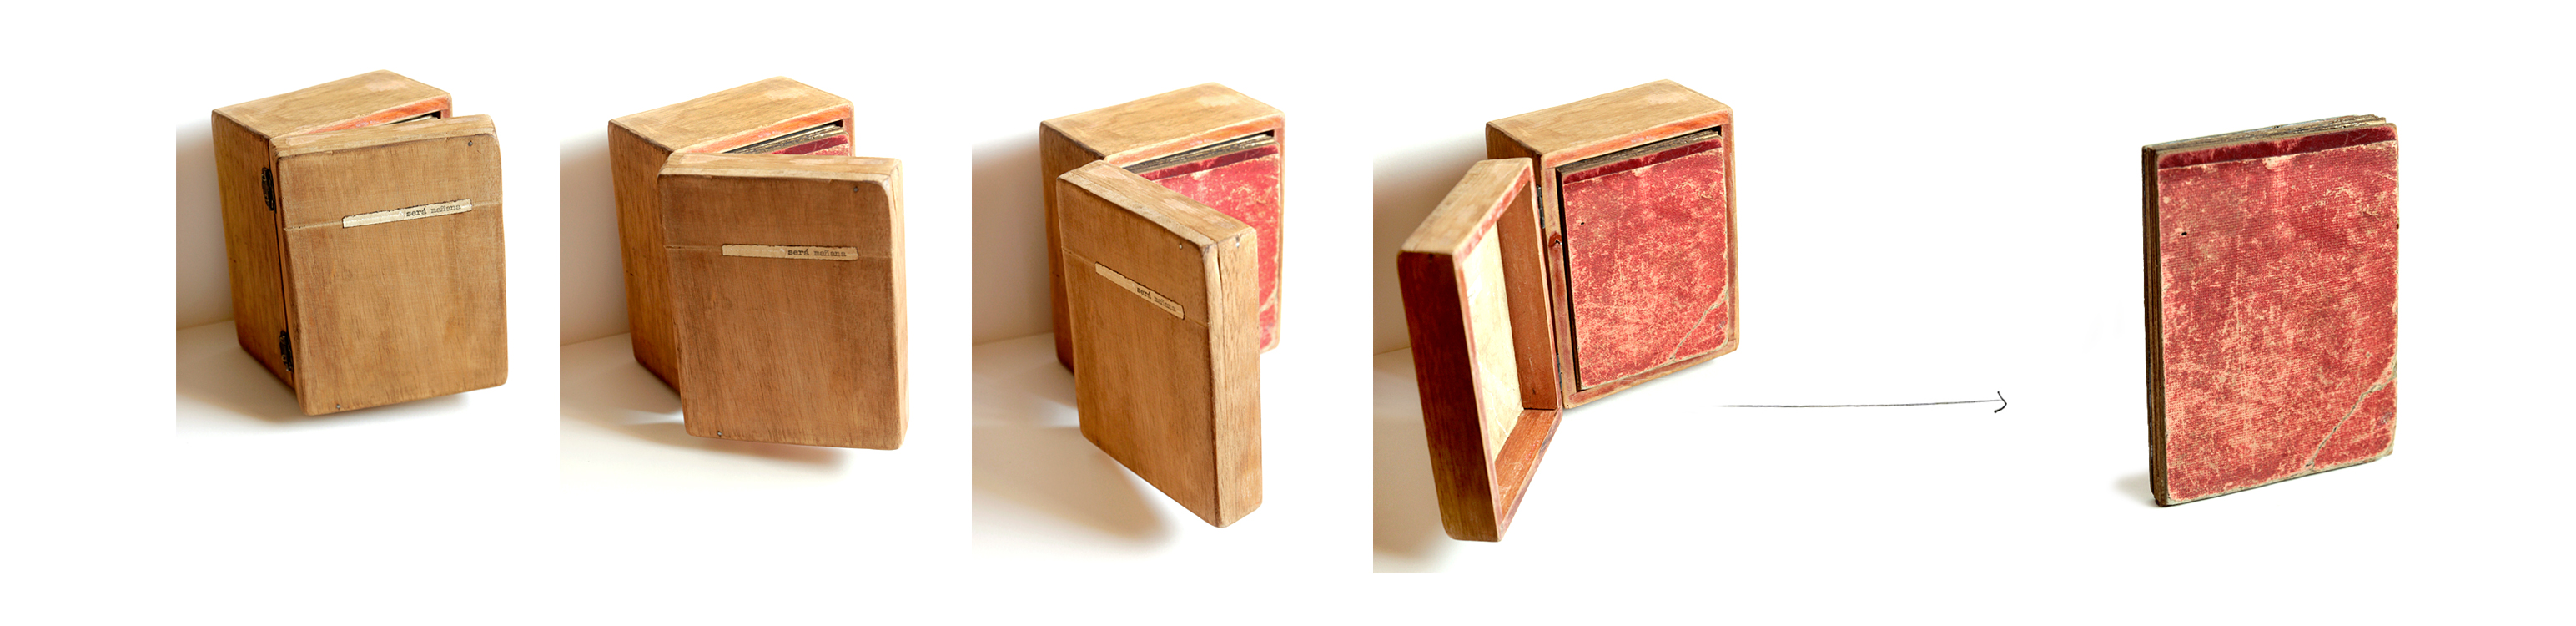 http://www.nodetenerse.com/files/gimgs/197_libroseramananalineaweb00.jpg